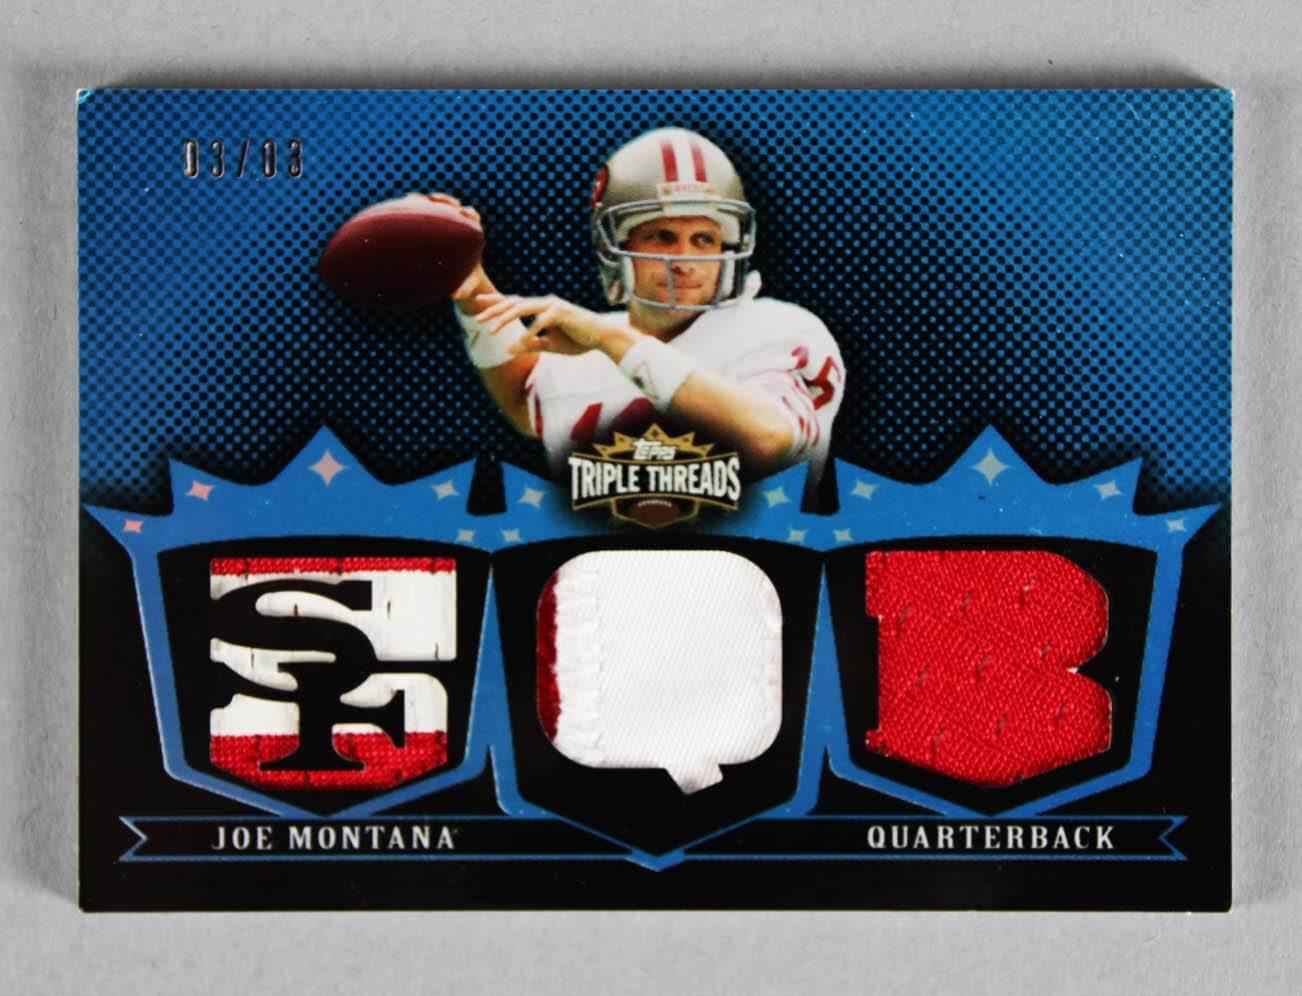 2007 Topps Triple Threads Joe Montana Game-Used 49ers Jersey Card 3/3